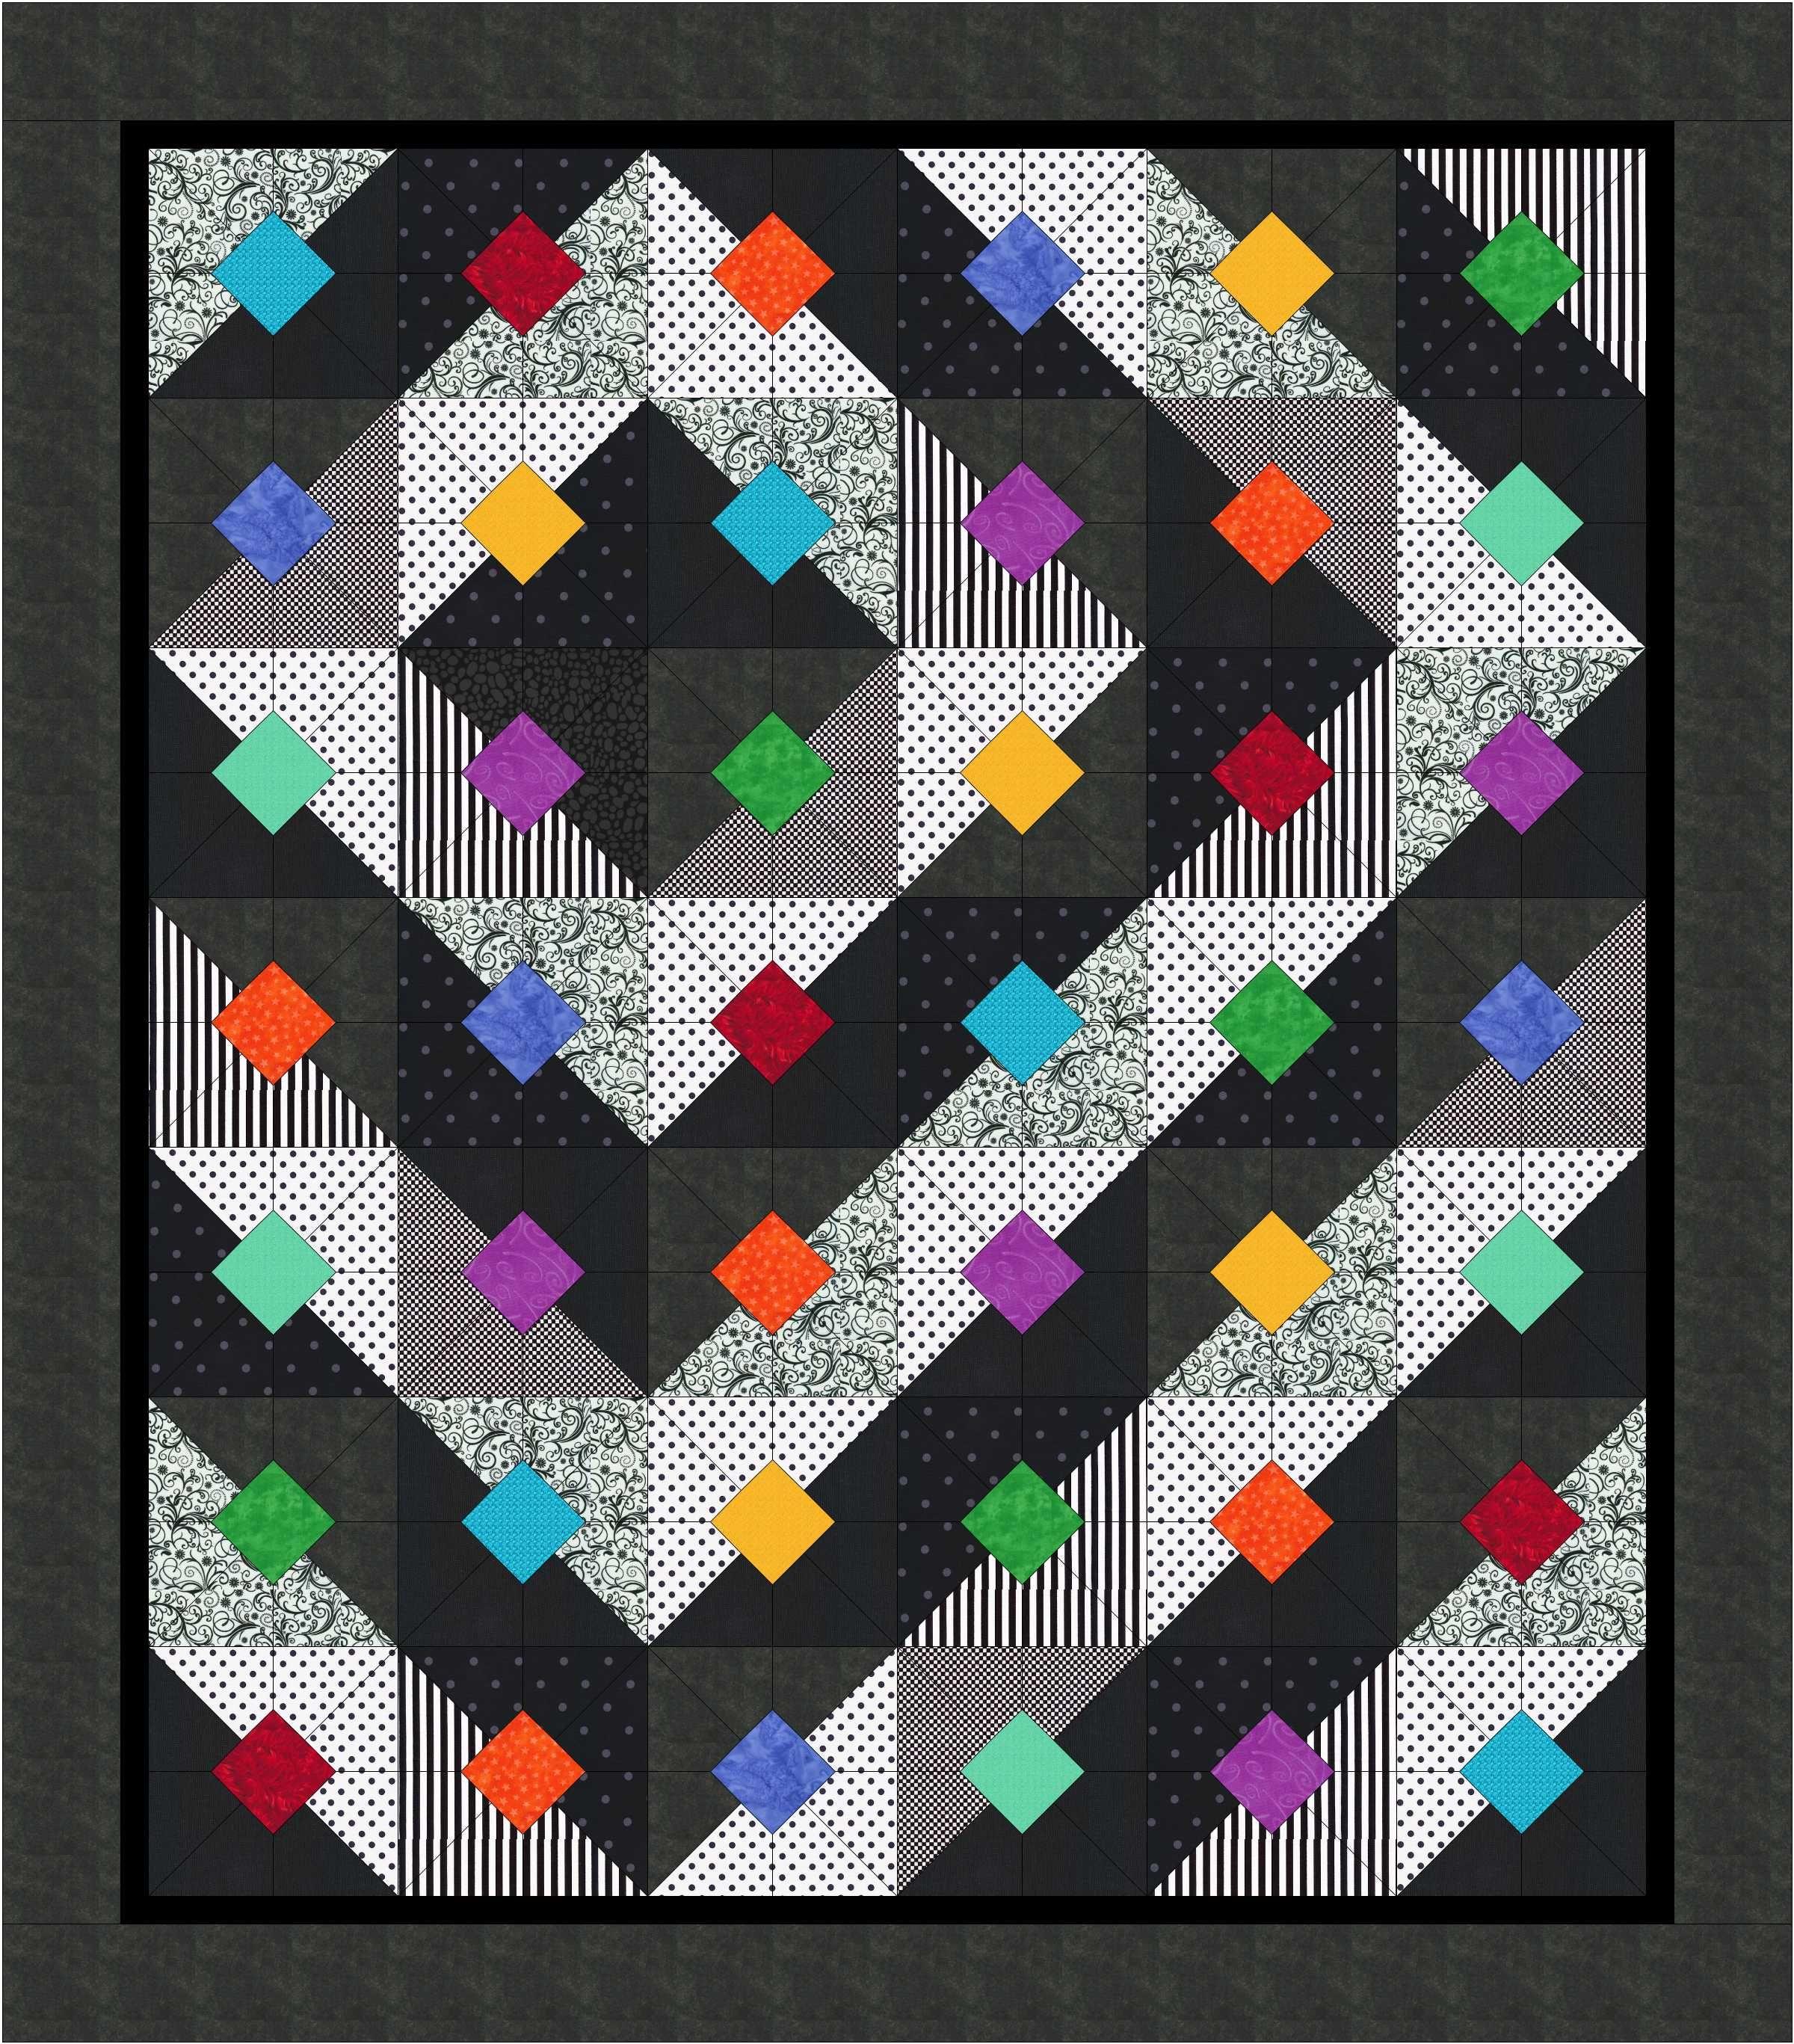 Pin by Louise Da Silva on Quilts 13 | Pinterest | Free pattern ... : free quilting tutorials online - Adamdwight.com